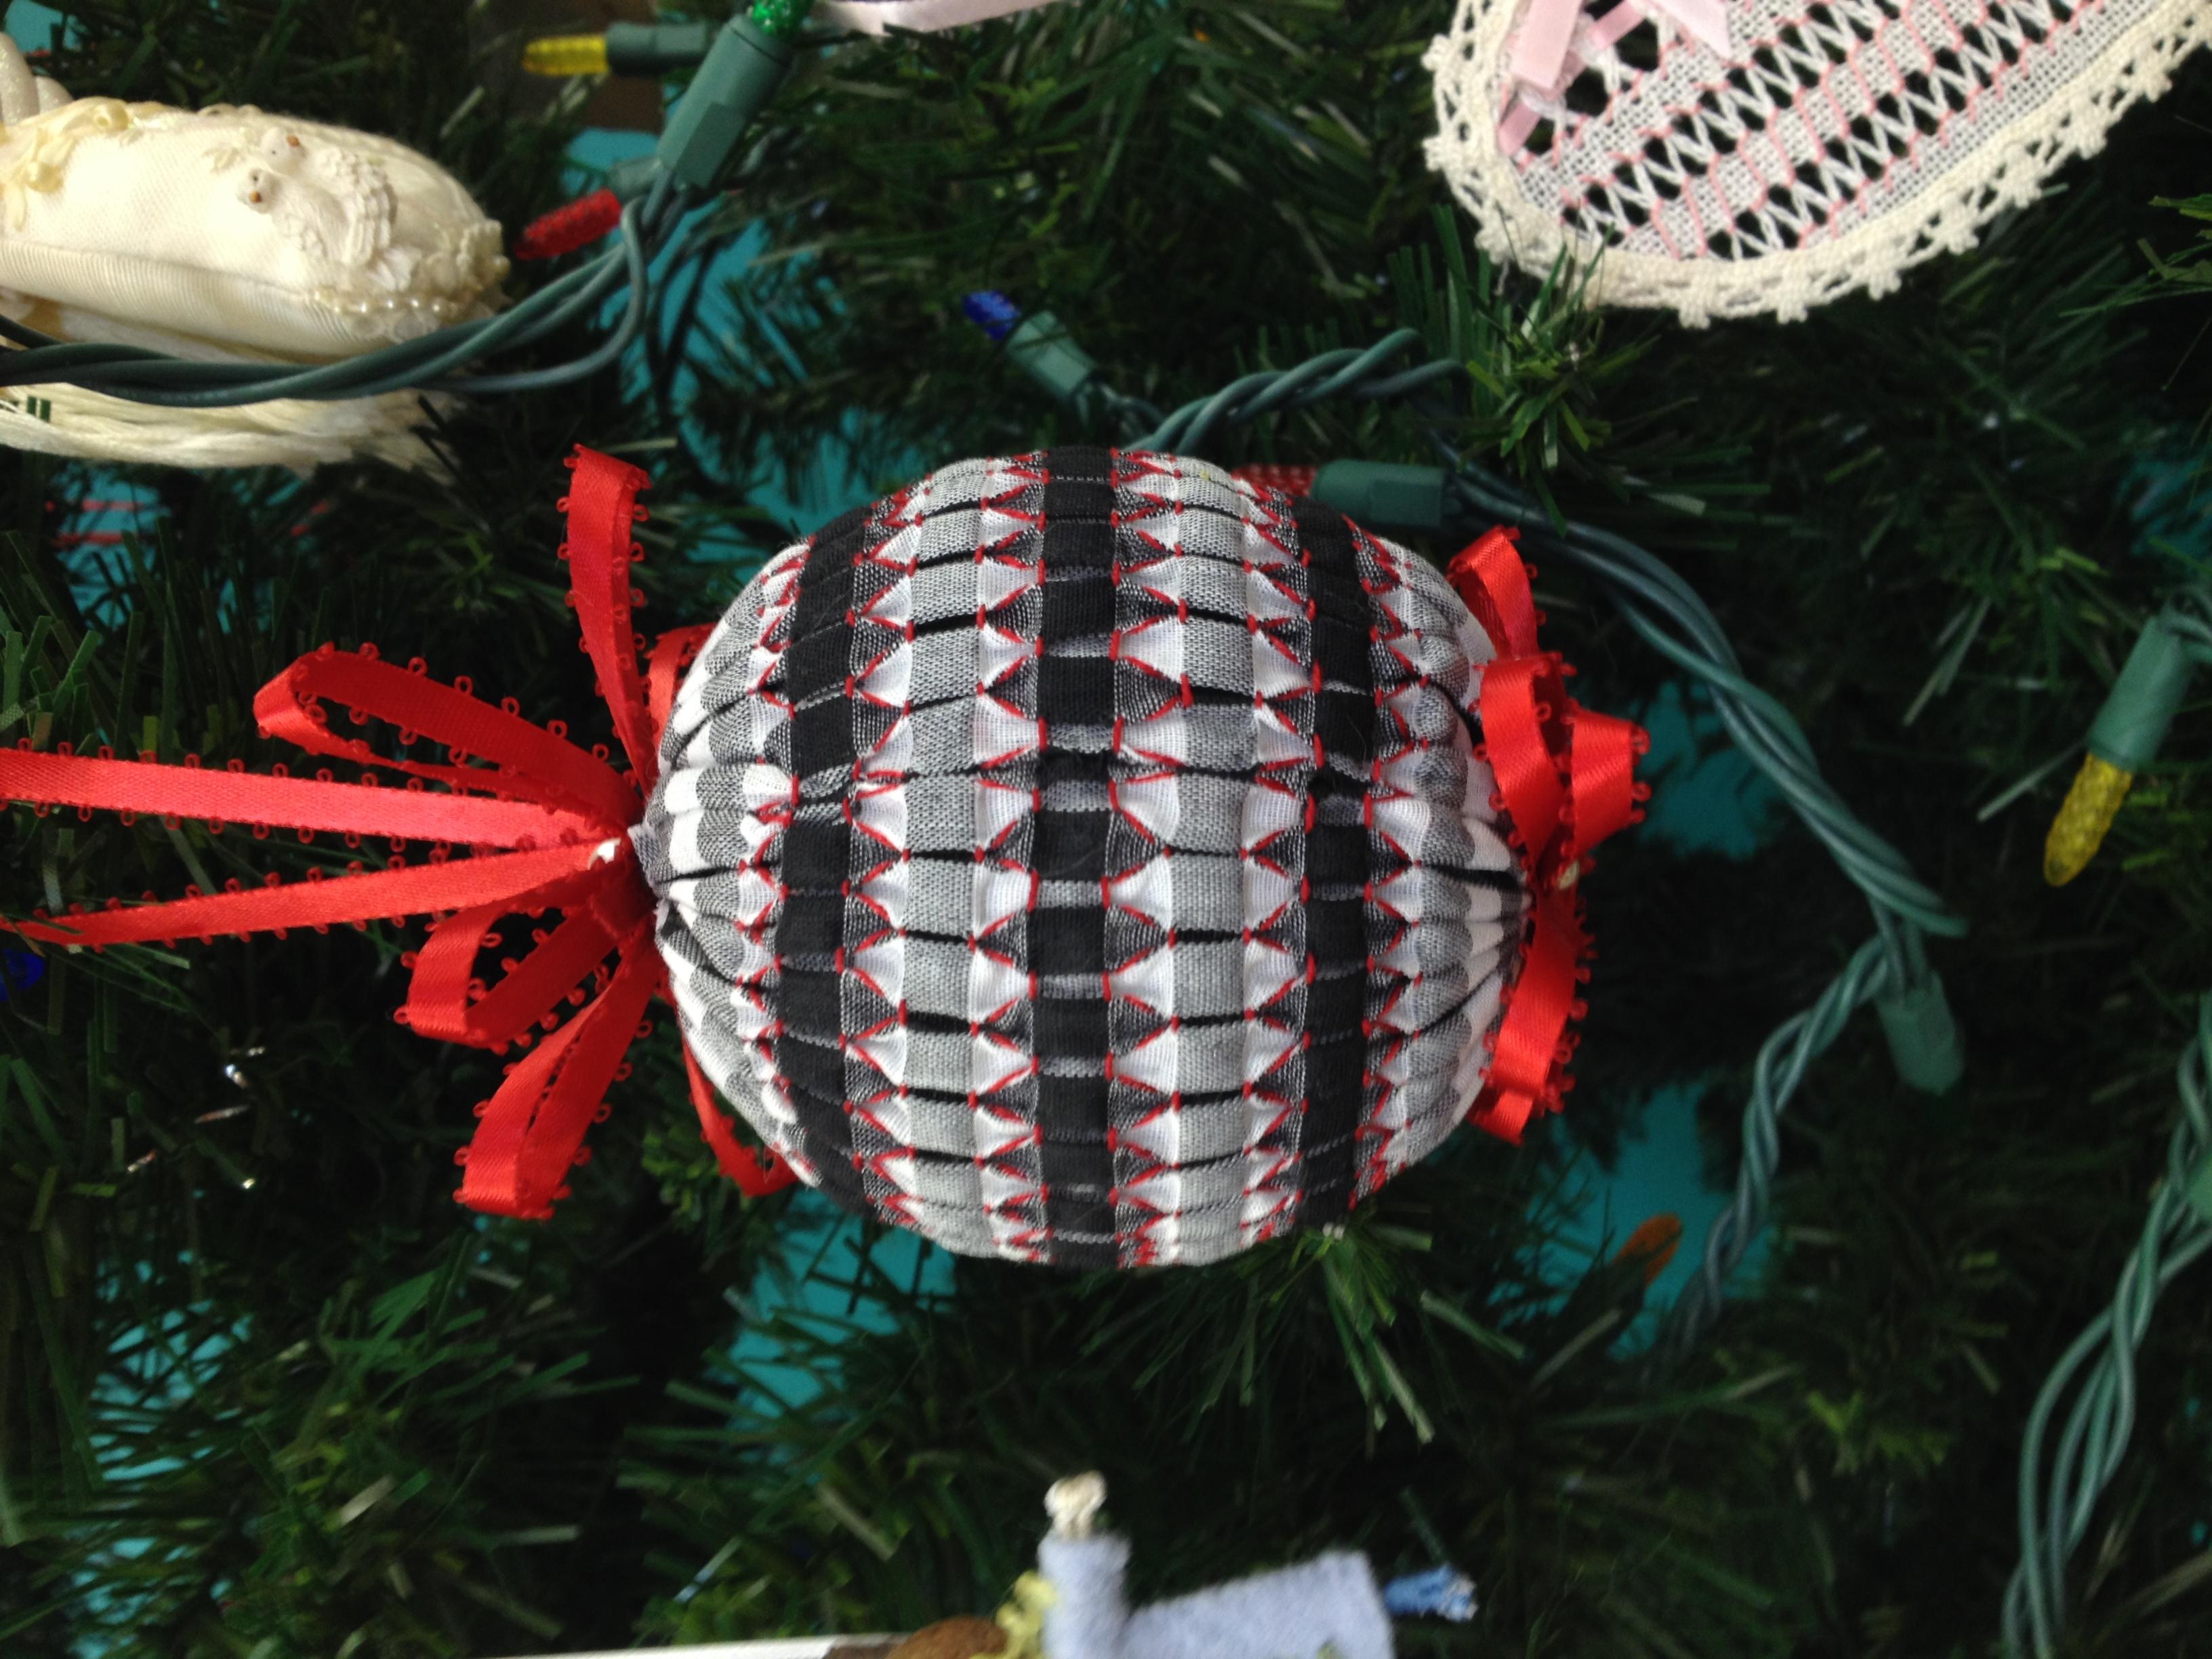 smocked ball on gingham fabric